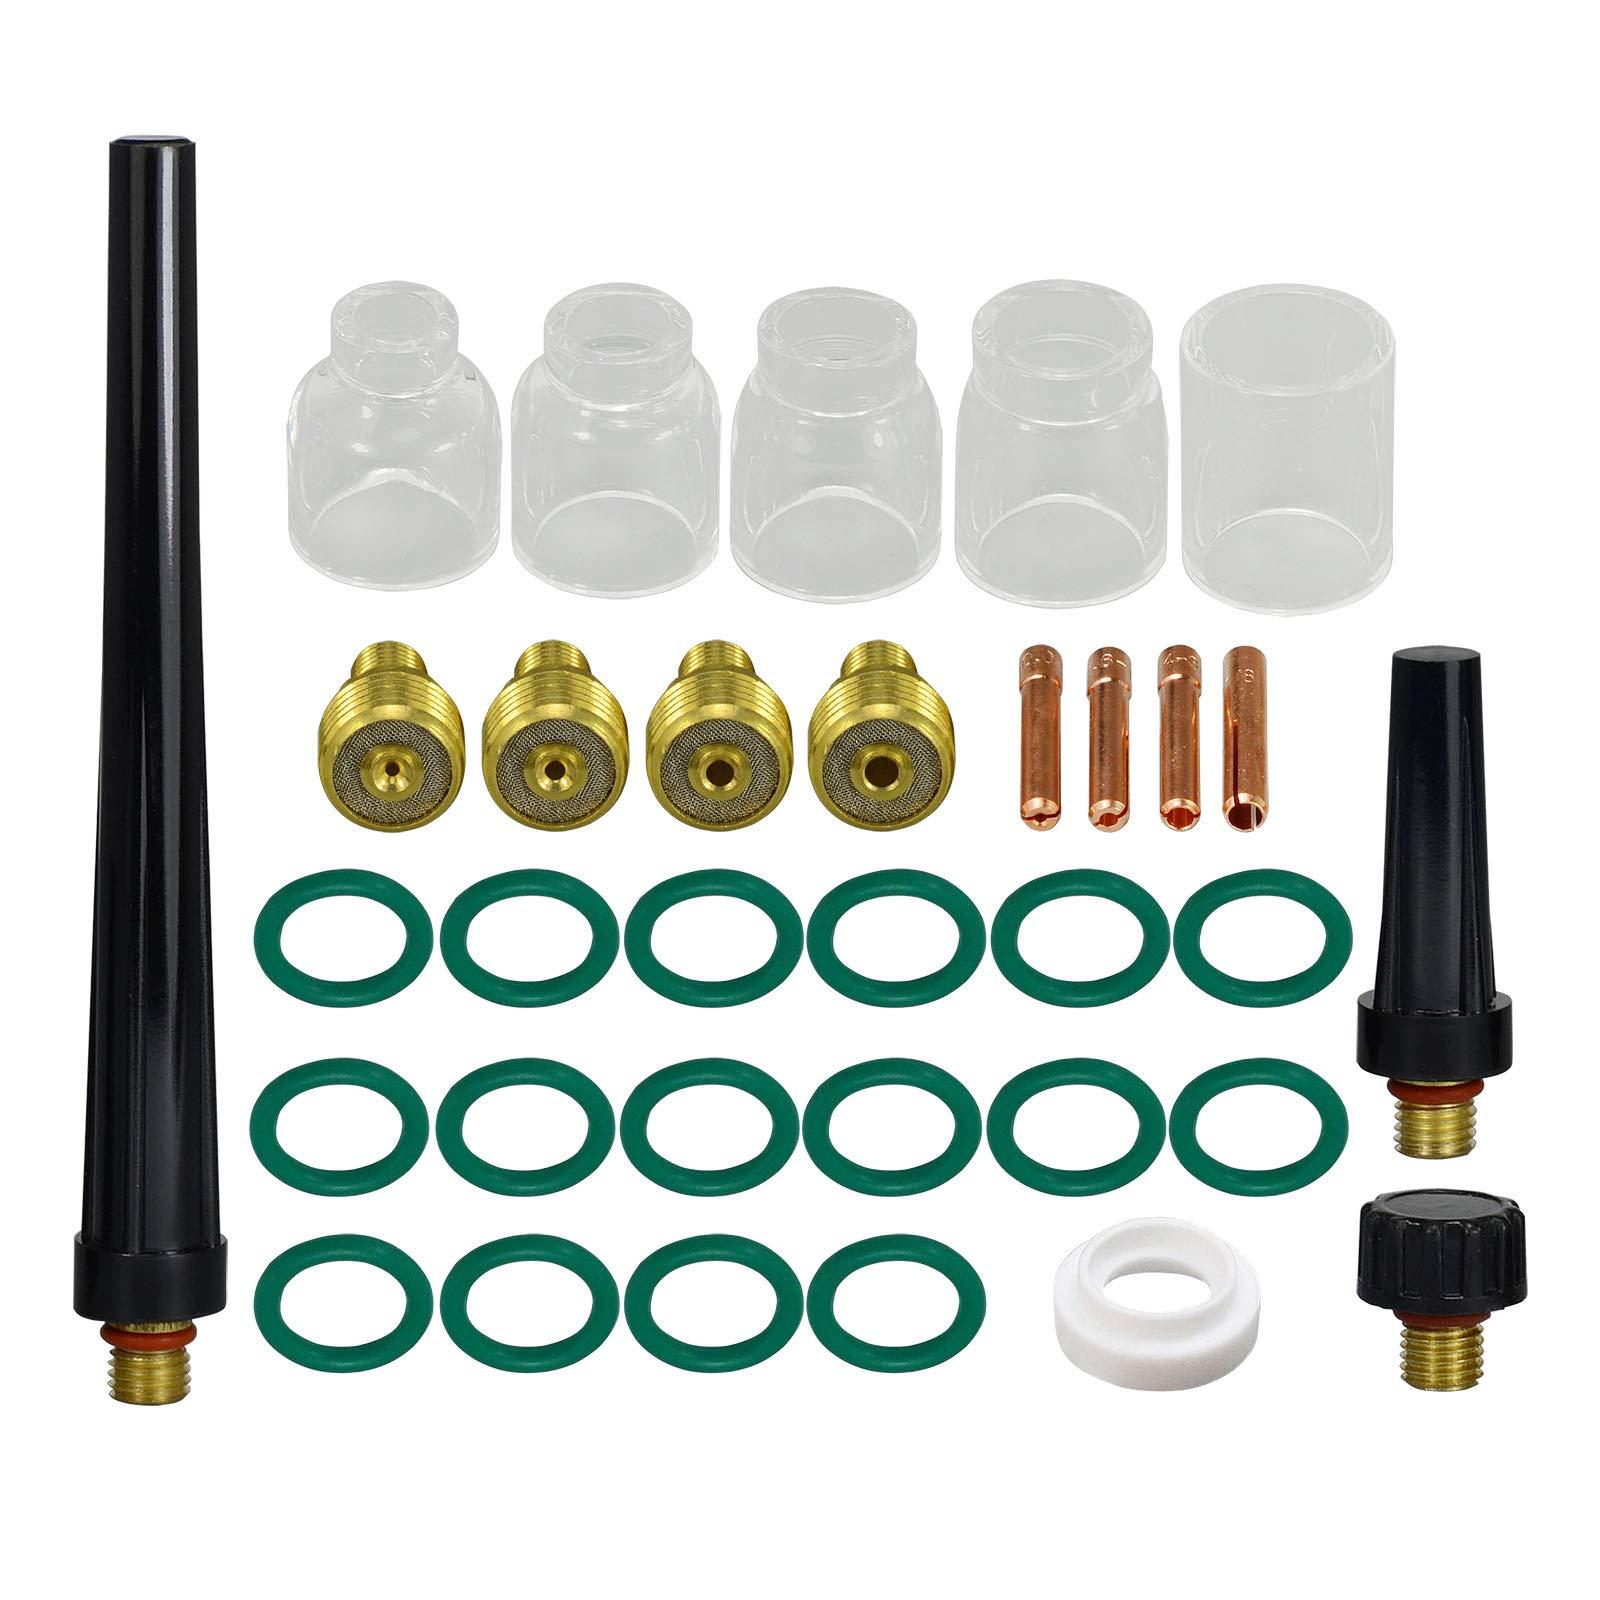 TIG Gas Lens Collet Body 0.040 1//16 3//32 1//8 /& #5#6#7#8#10 Pyrex Cup Kit DB SR WP 9 20 25 TIG Welding Torch 33pcs